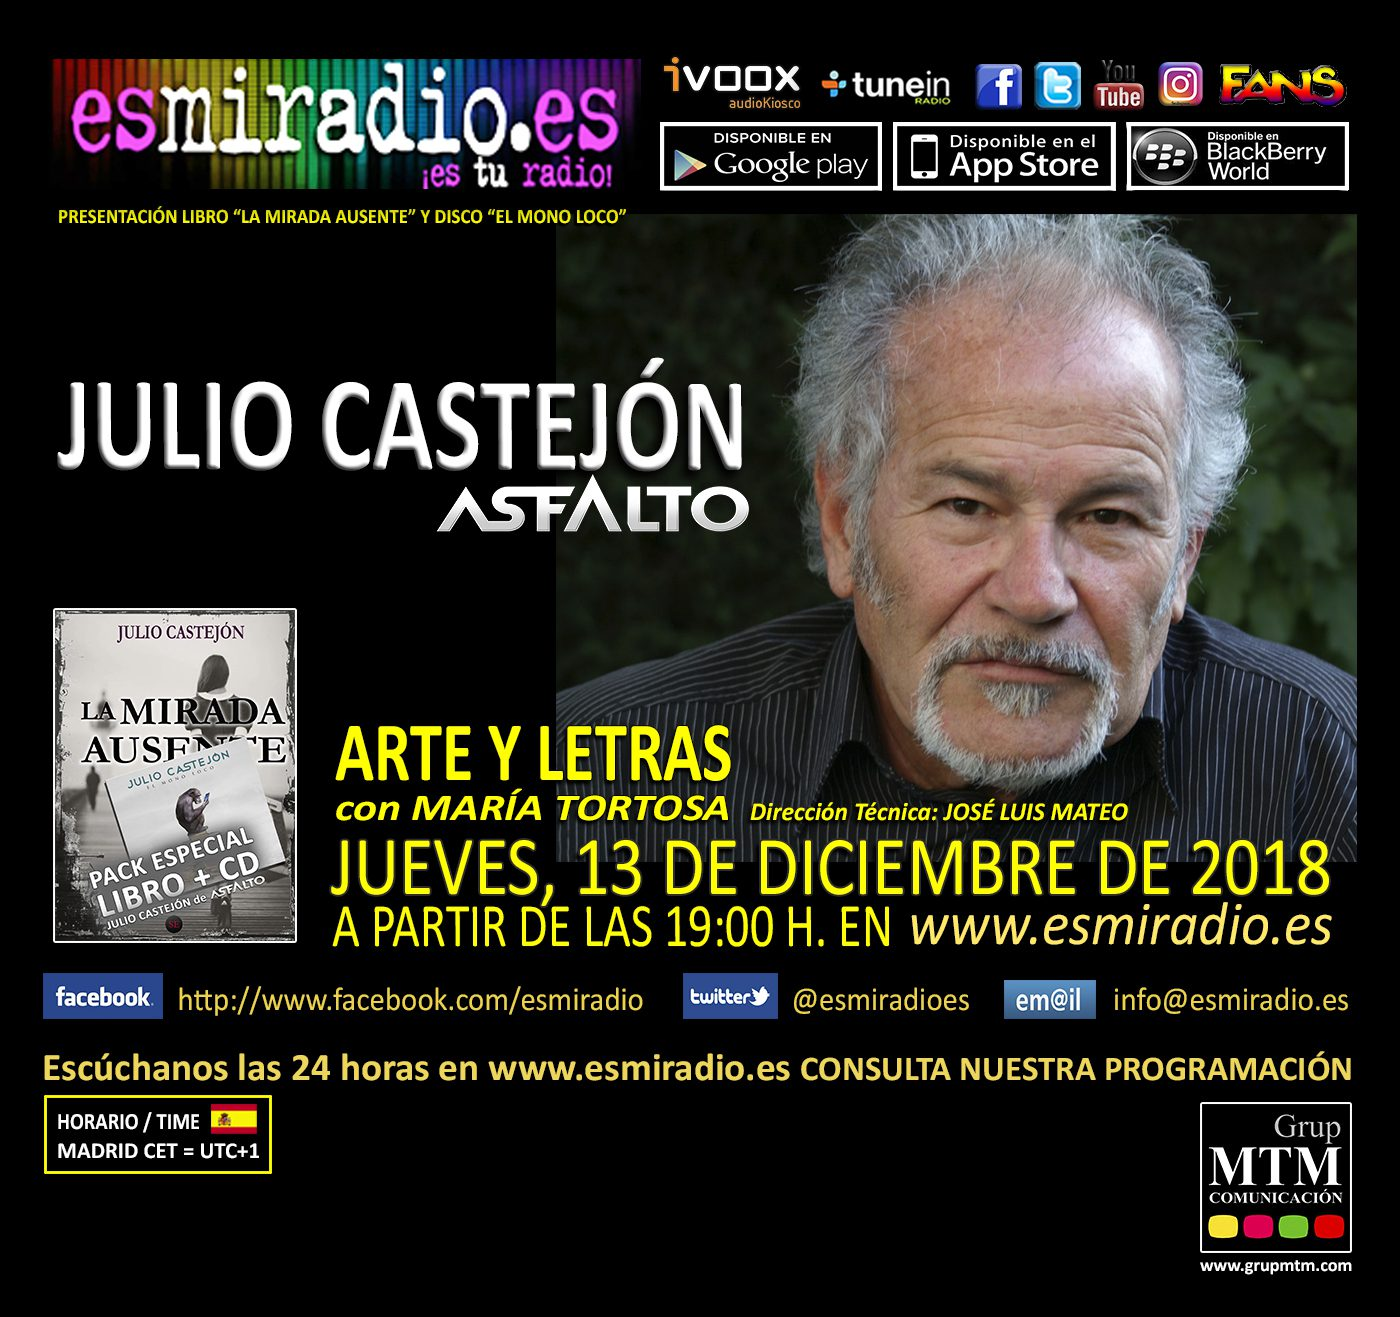 Julio Castejón 131218 - esmiradio